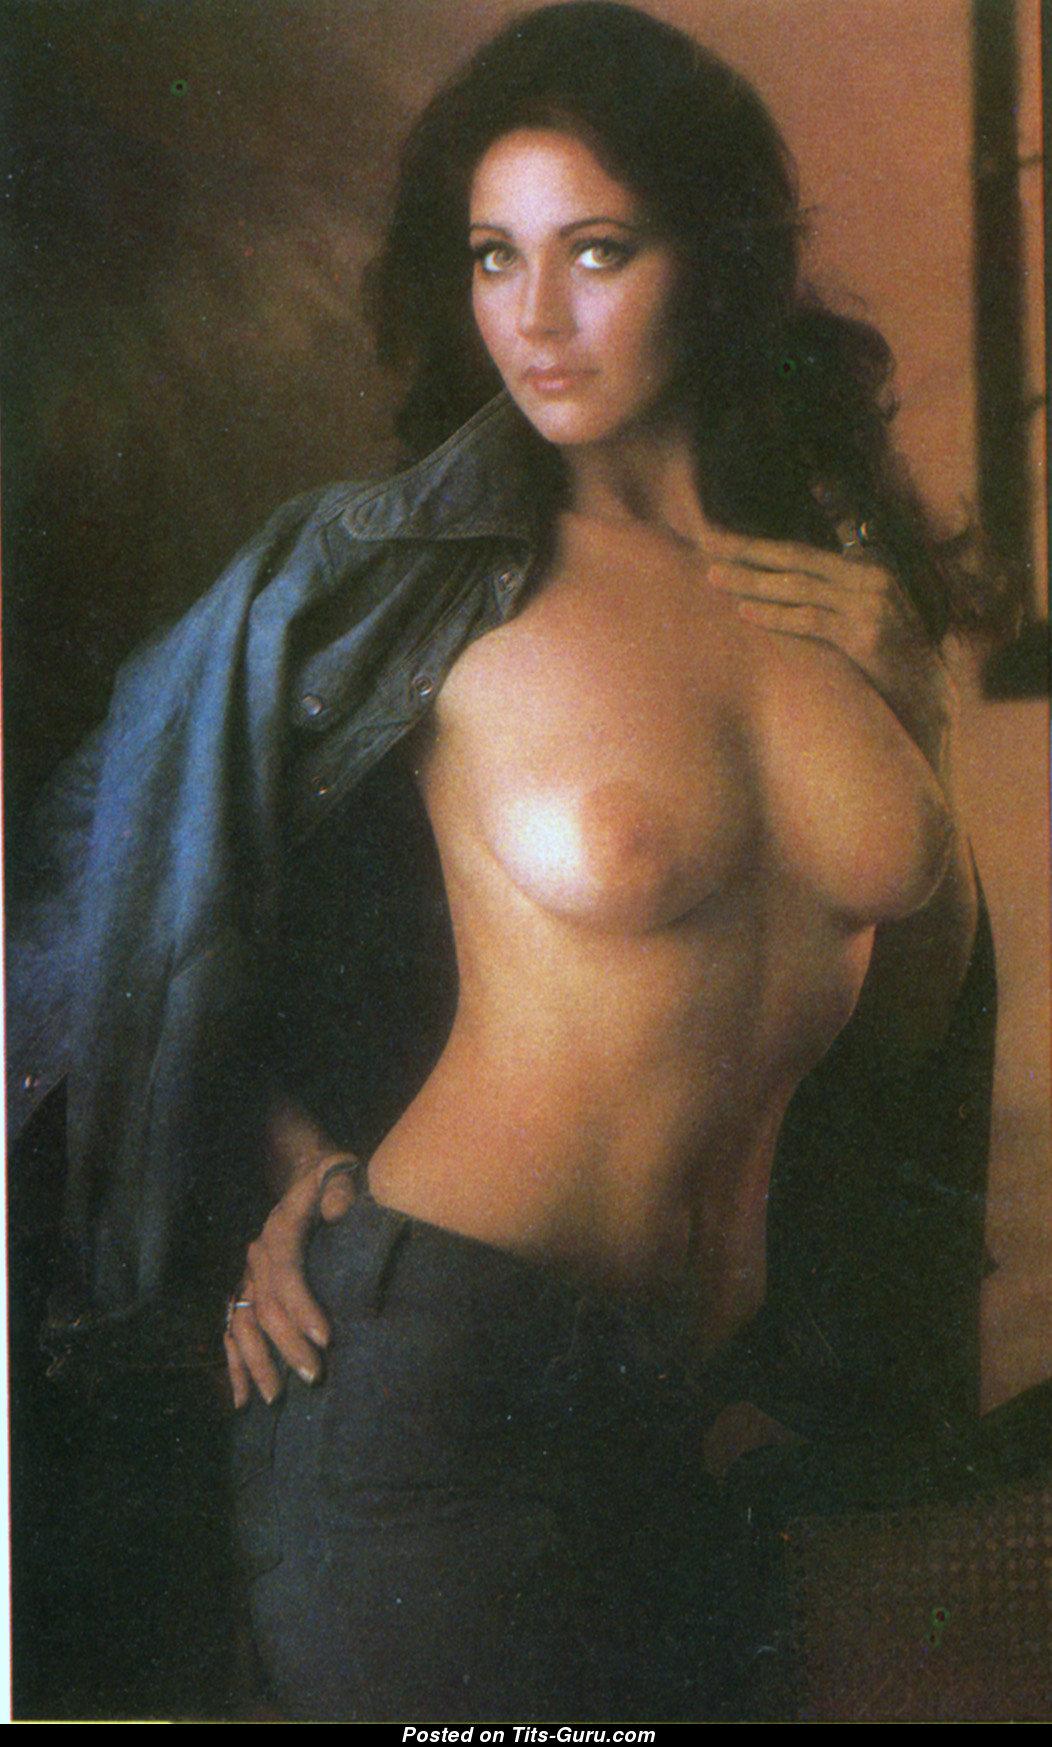 Linda Carter Tits